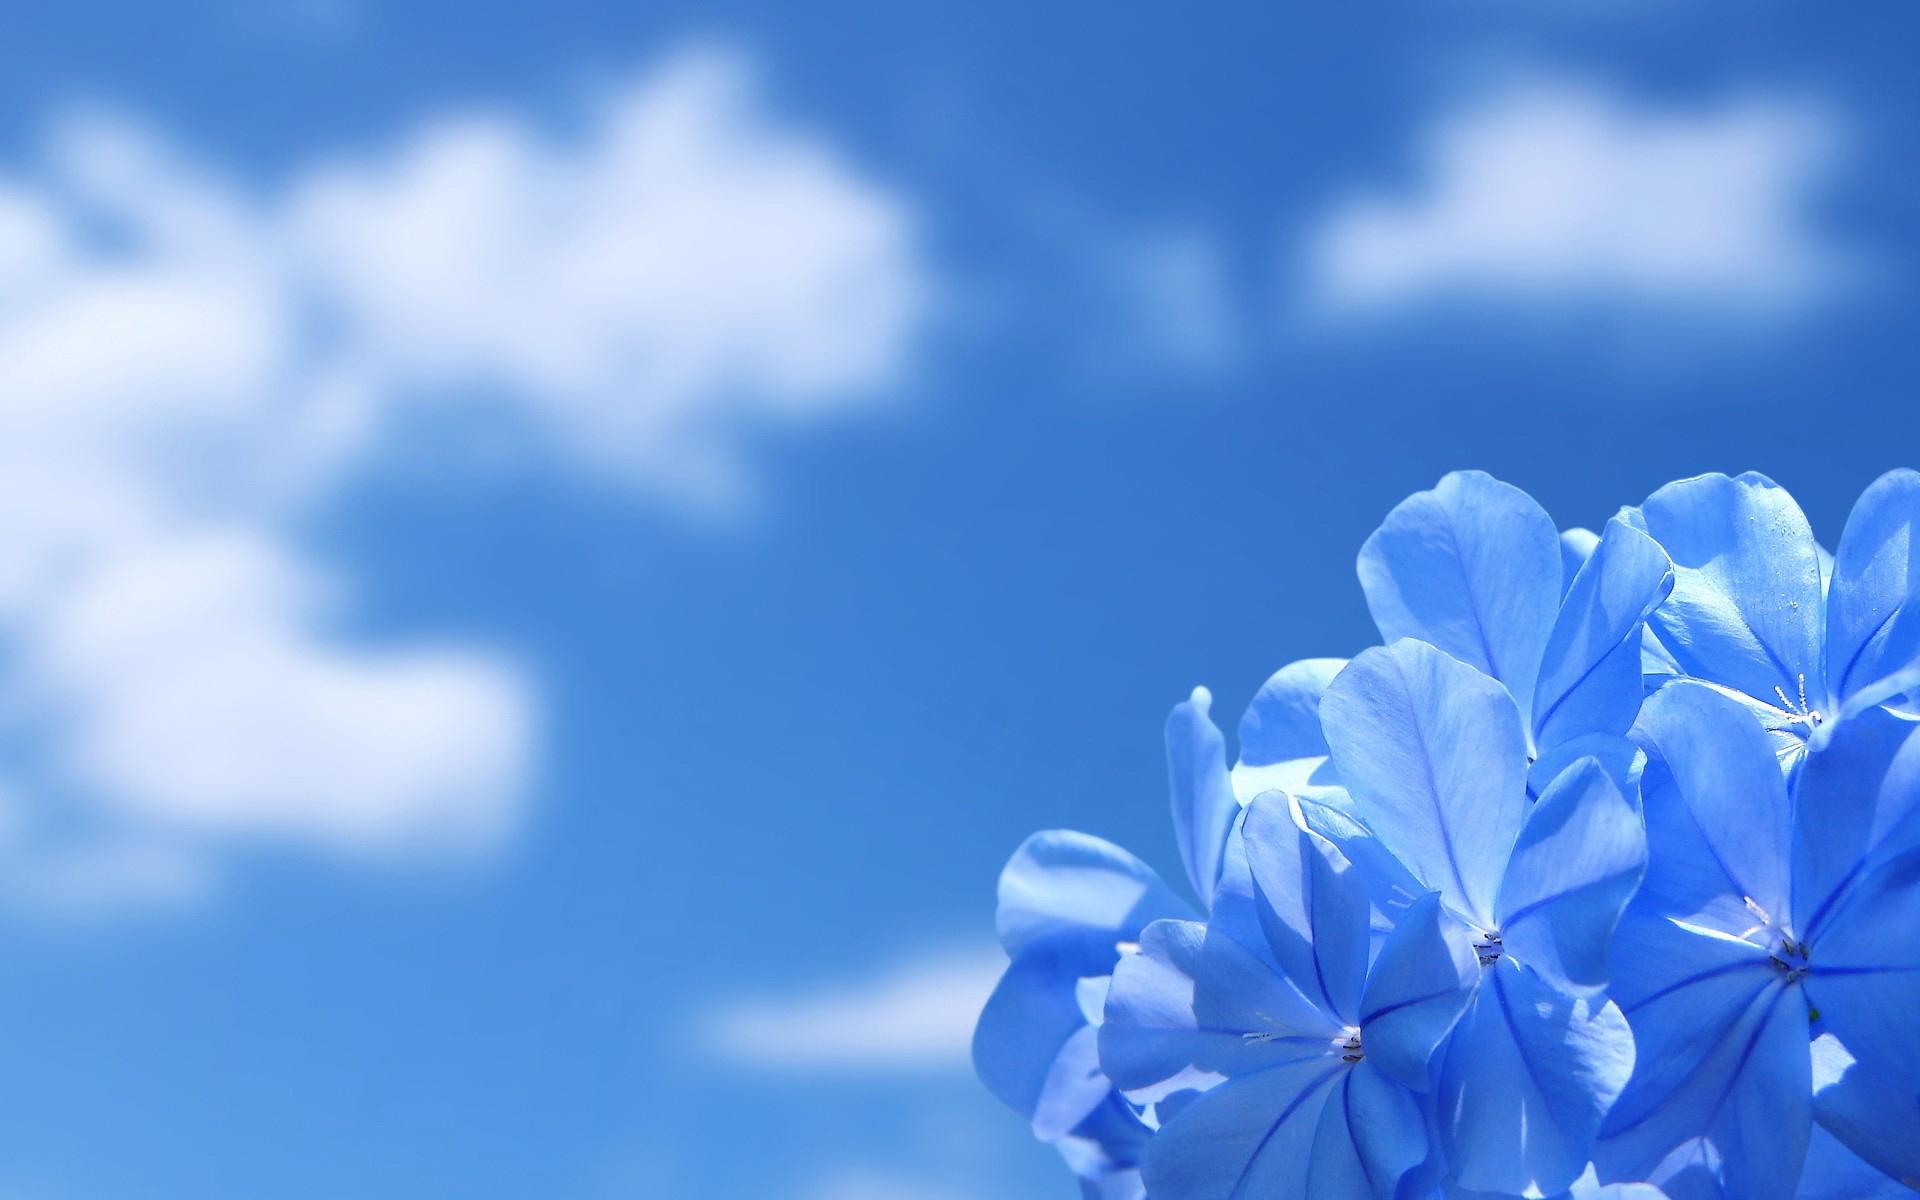 Blue sky blue flower wallpaper Download HD Wallpapers for Desktop 1920x1200